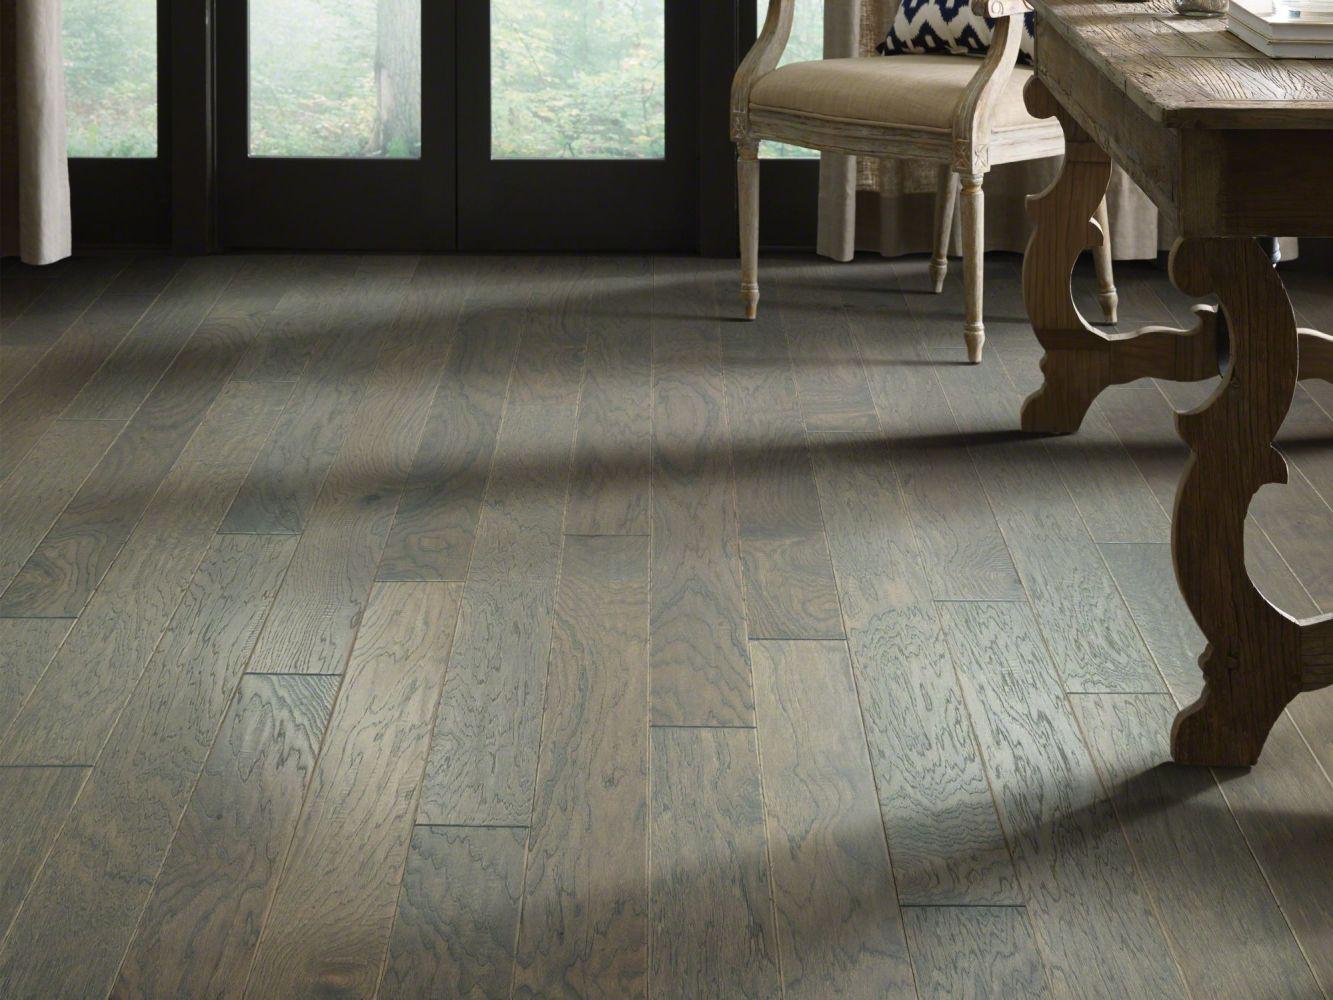 Shaw Floors Duras Hardwood Gallatin Hickory Slate 05039_HW592